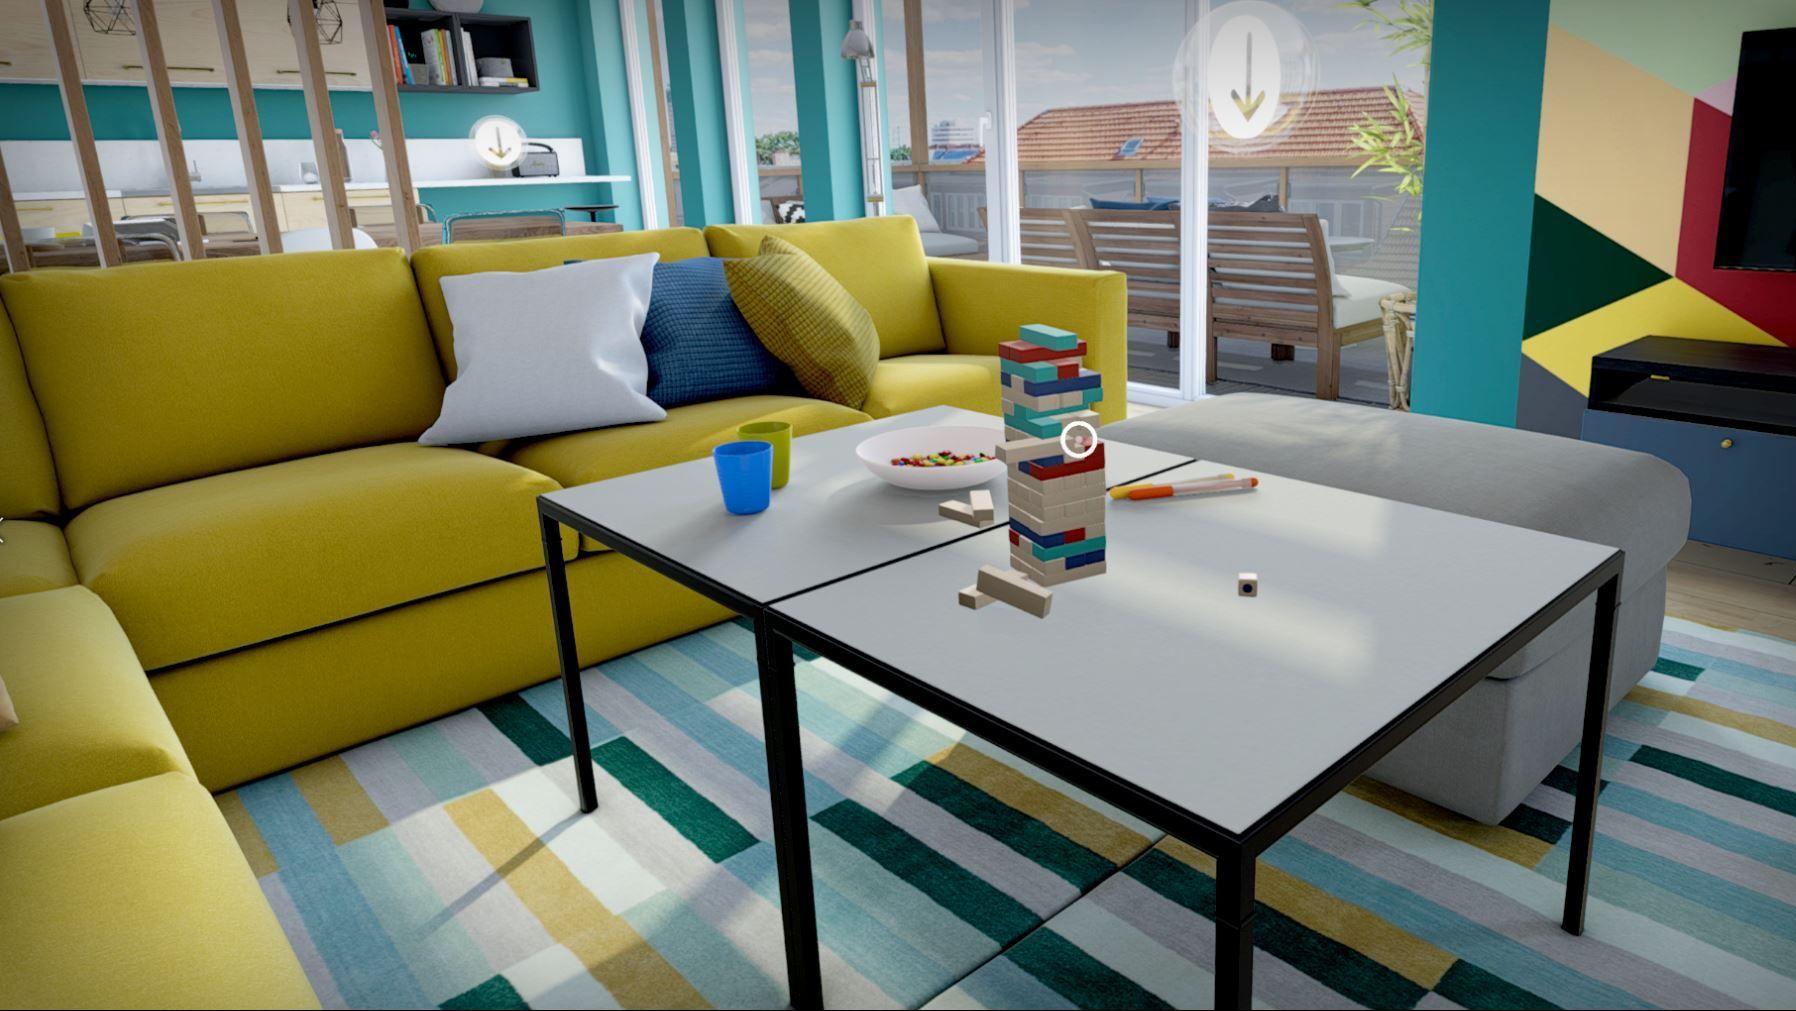 oculus ikea bringt seinen m bel katalog in die virtuelle realit t. Black Bedroom Furniture Sets. Home Design Ideas